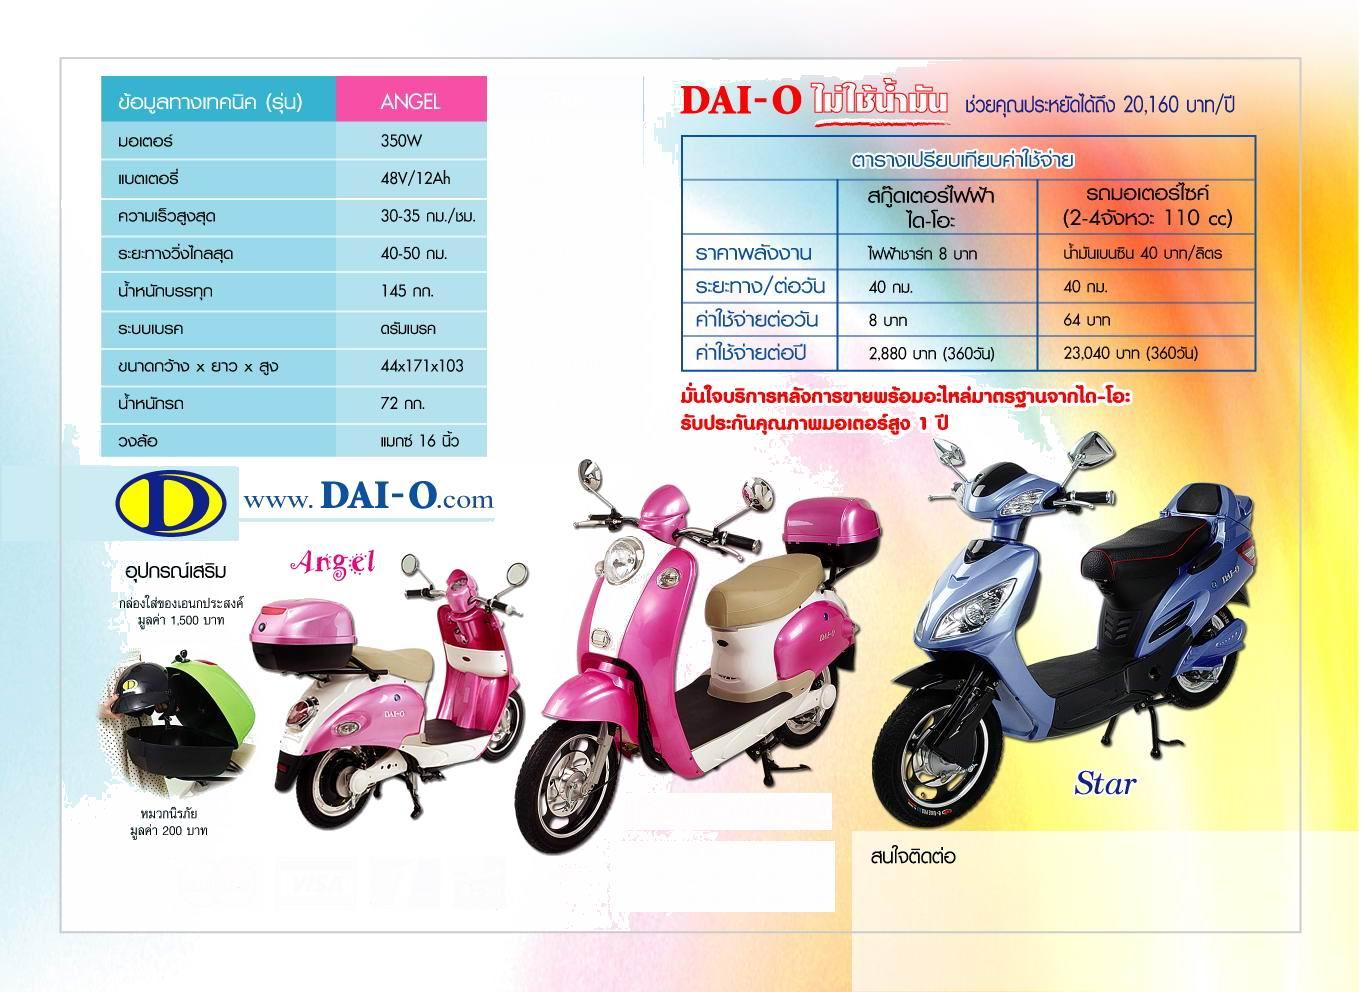 DAI-O มอเตอร์ไซค์ไฟฟ้า 350 วัตต์ วิ่งเร็ว 35 กม./ชม.